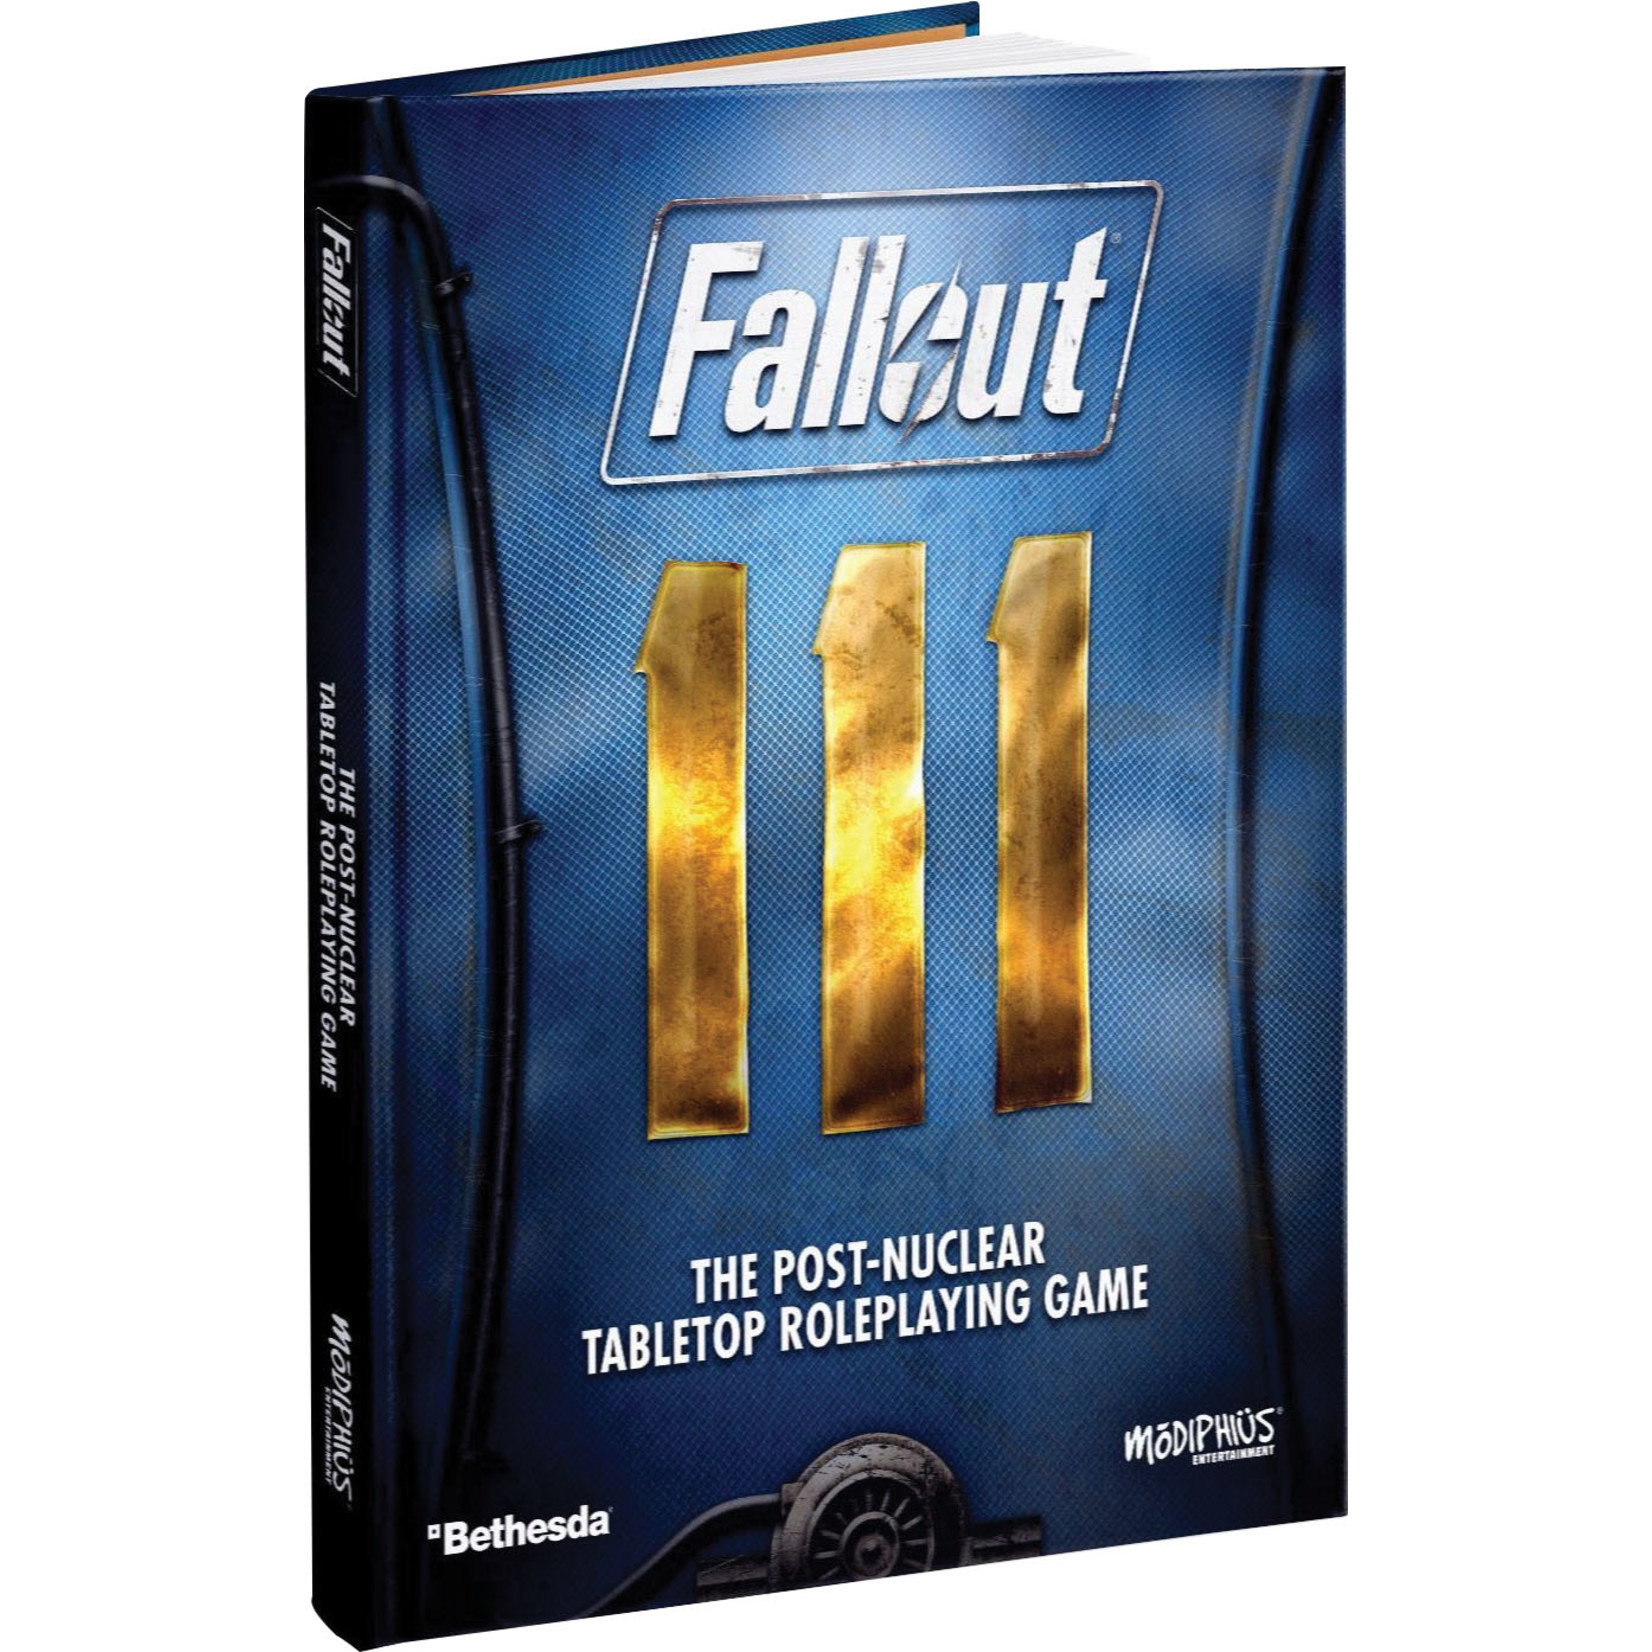 Fallout RPG: Core Rule Book